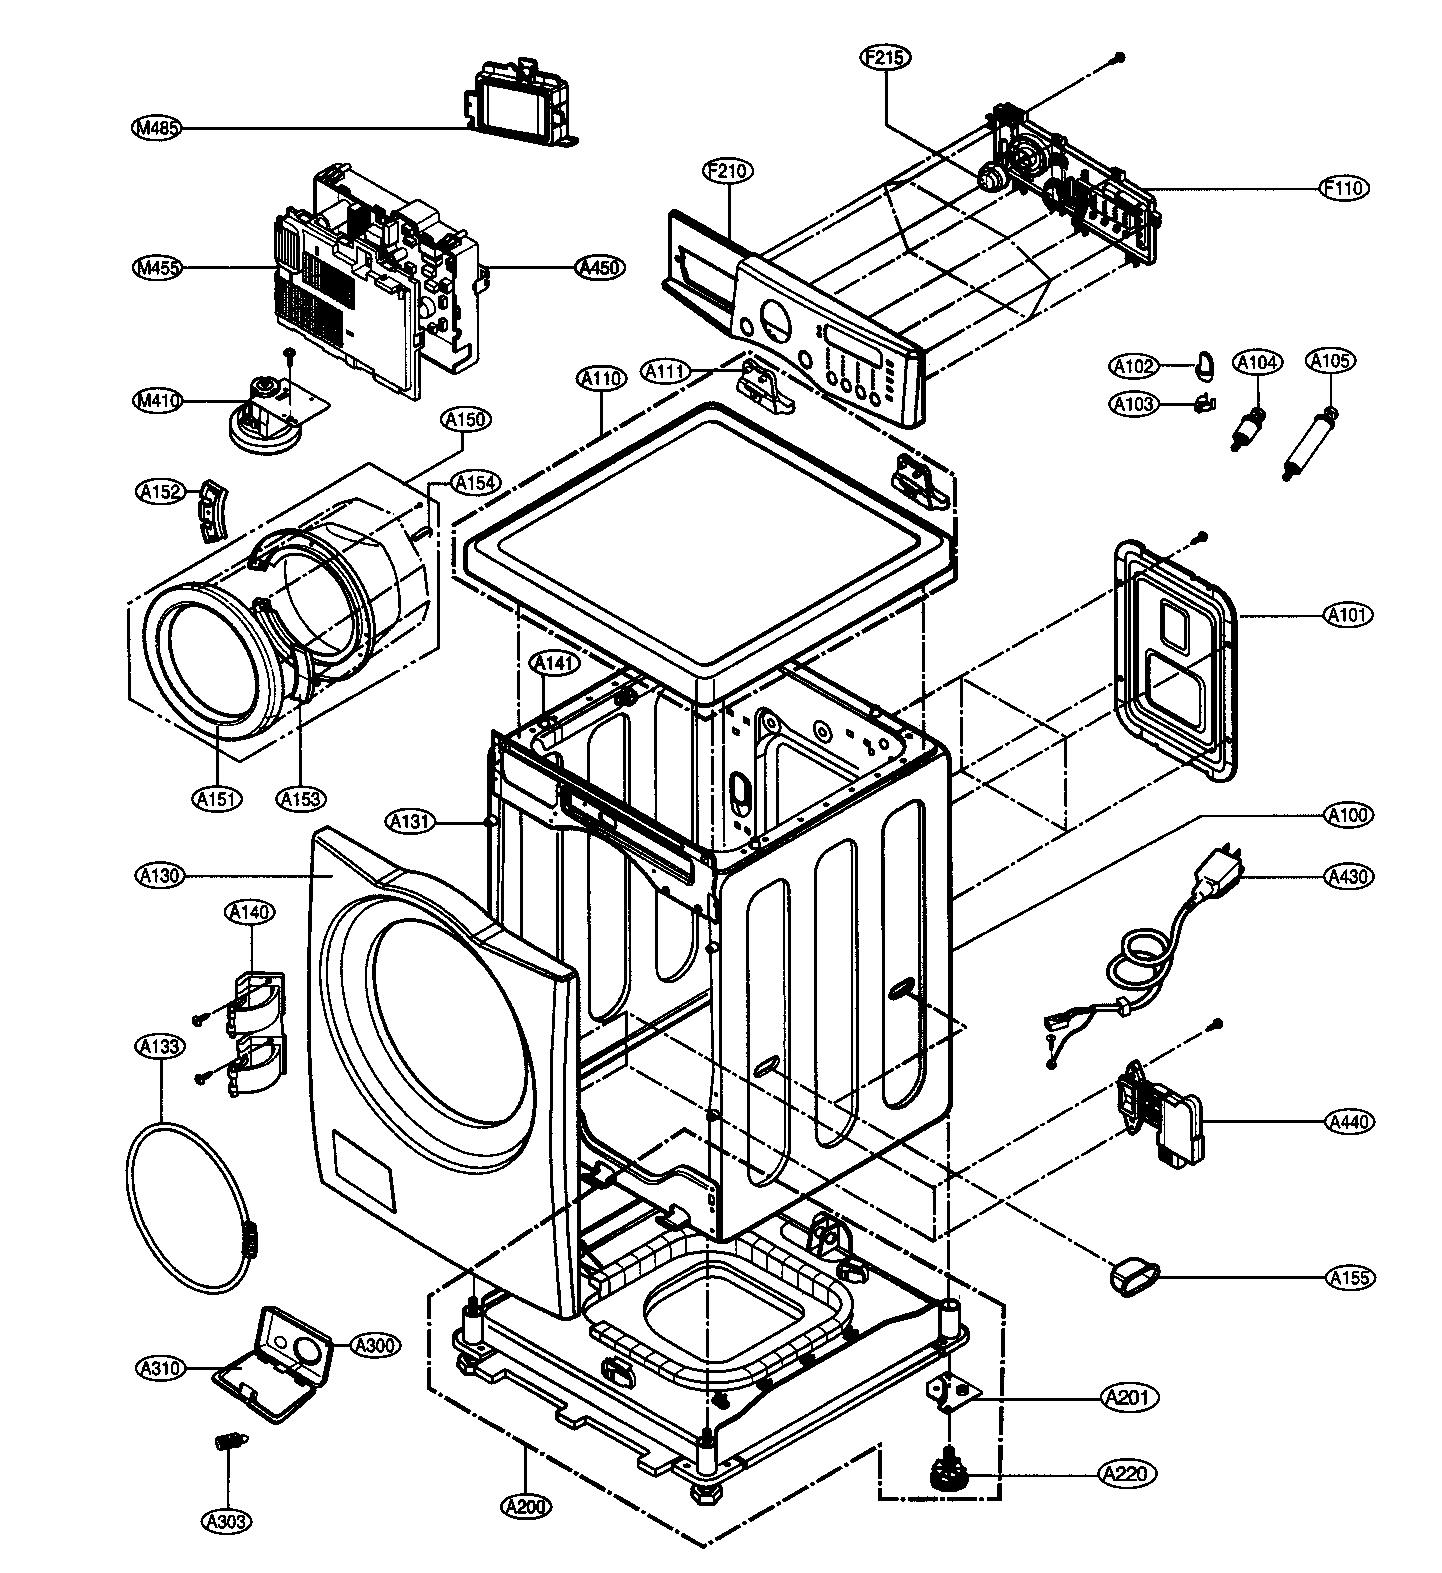 Wiring Diagram Front Load Washing